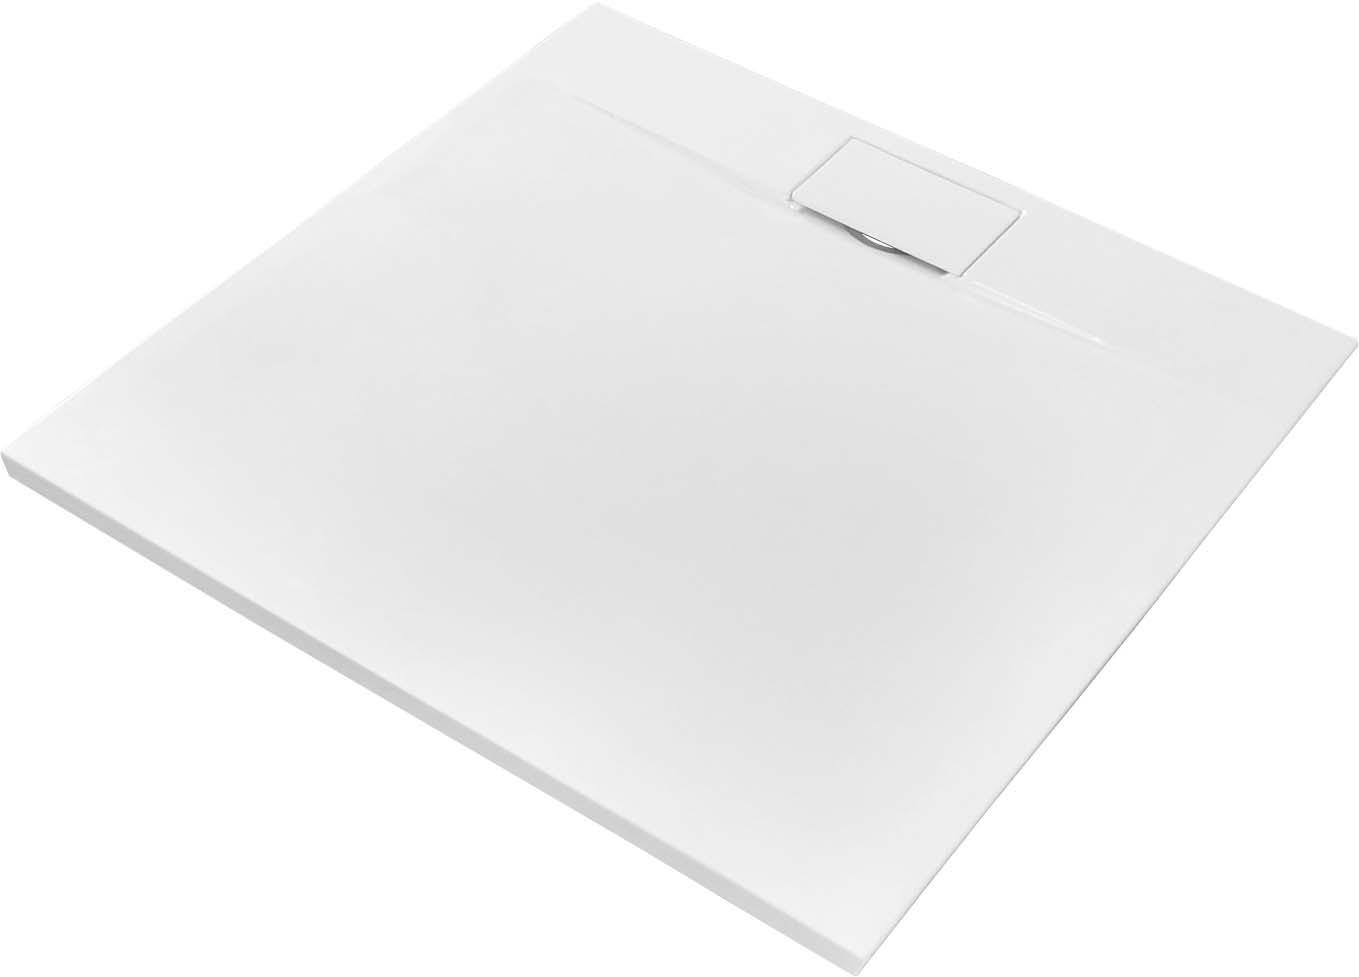 Поддон душевой WasserKRAFT Alme, квадрат, 90 х 90 см